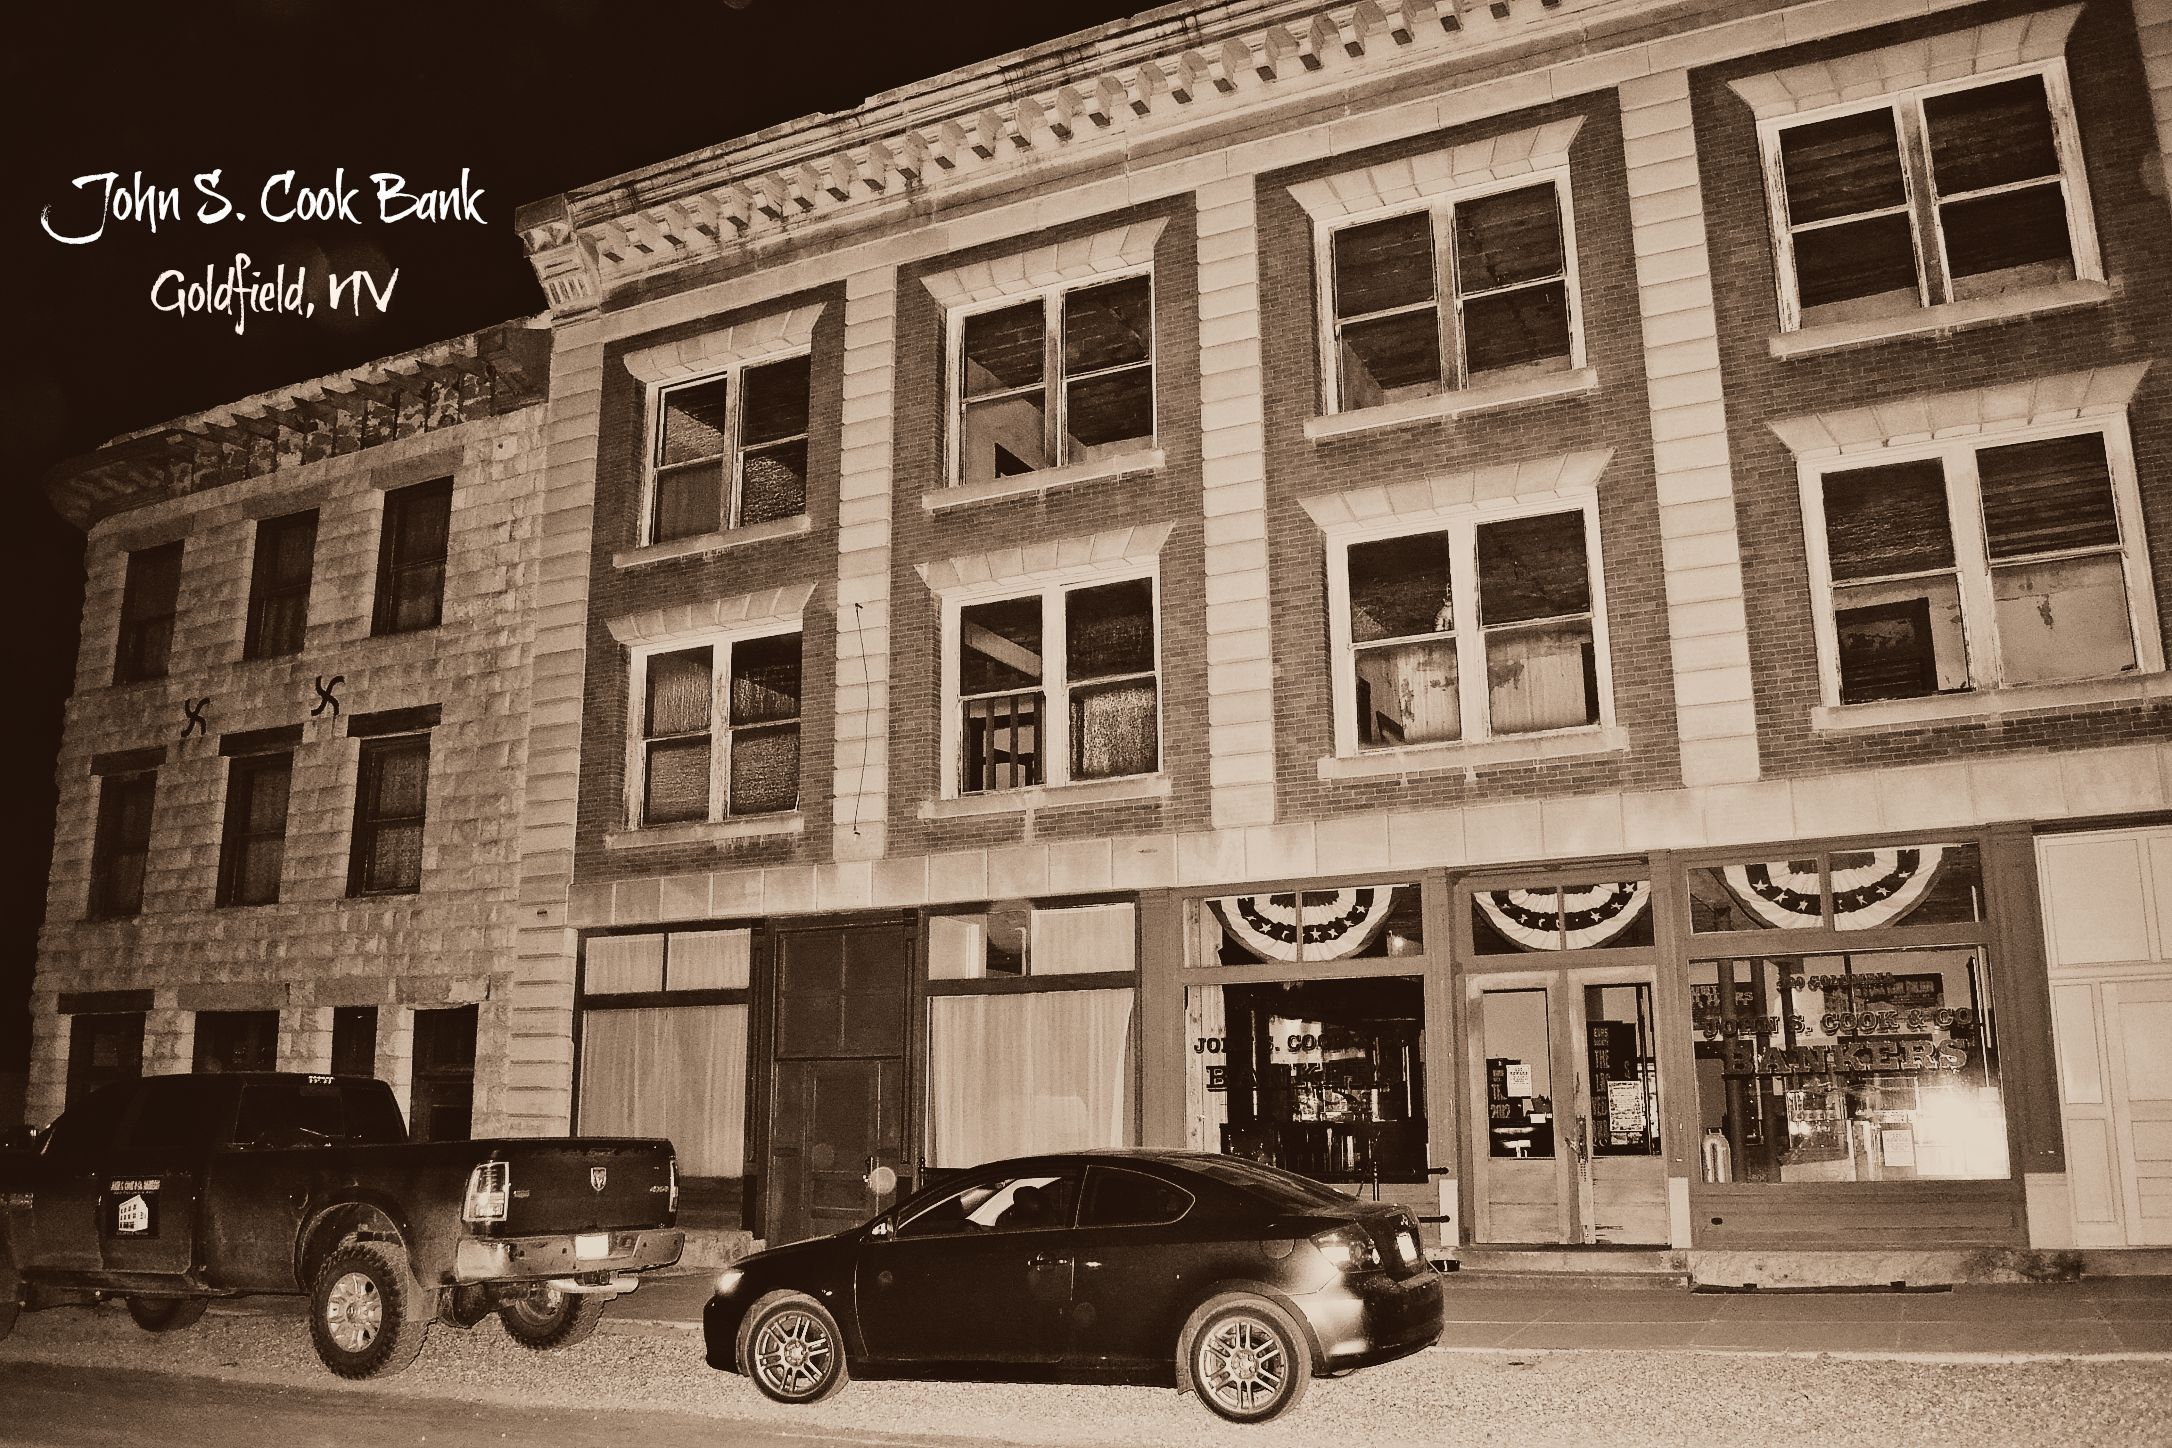 John S. Cook Bank building